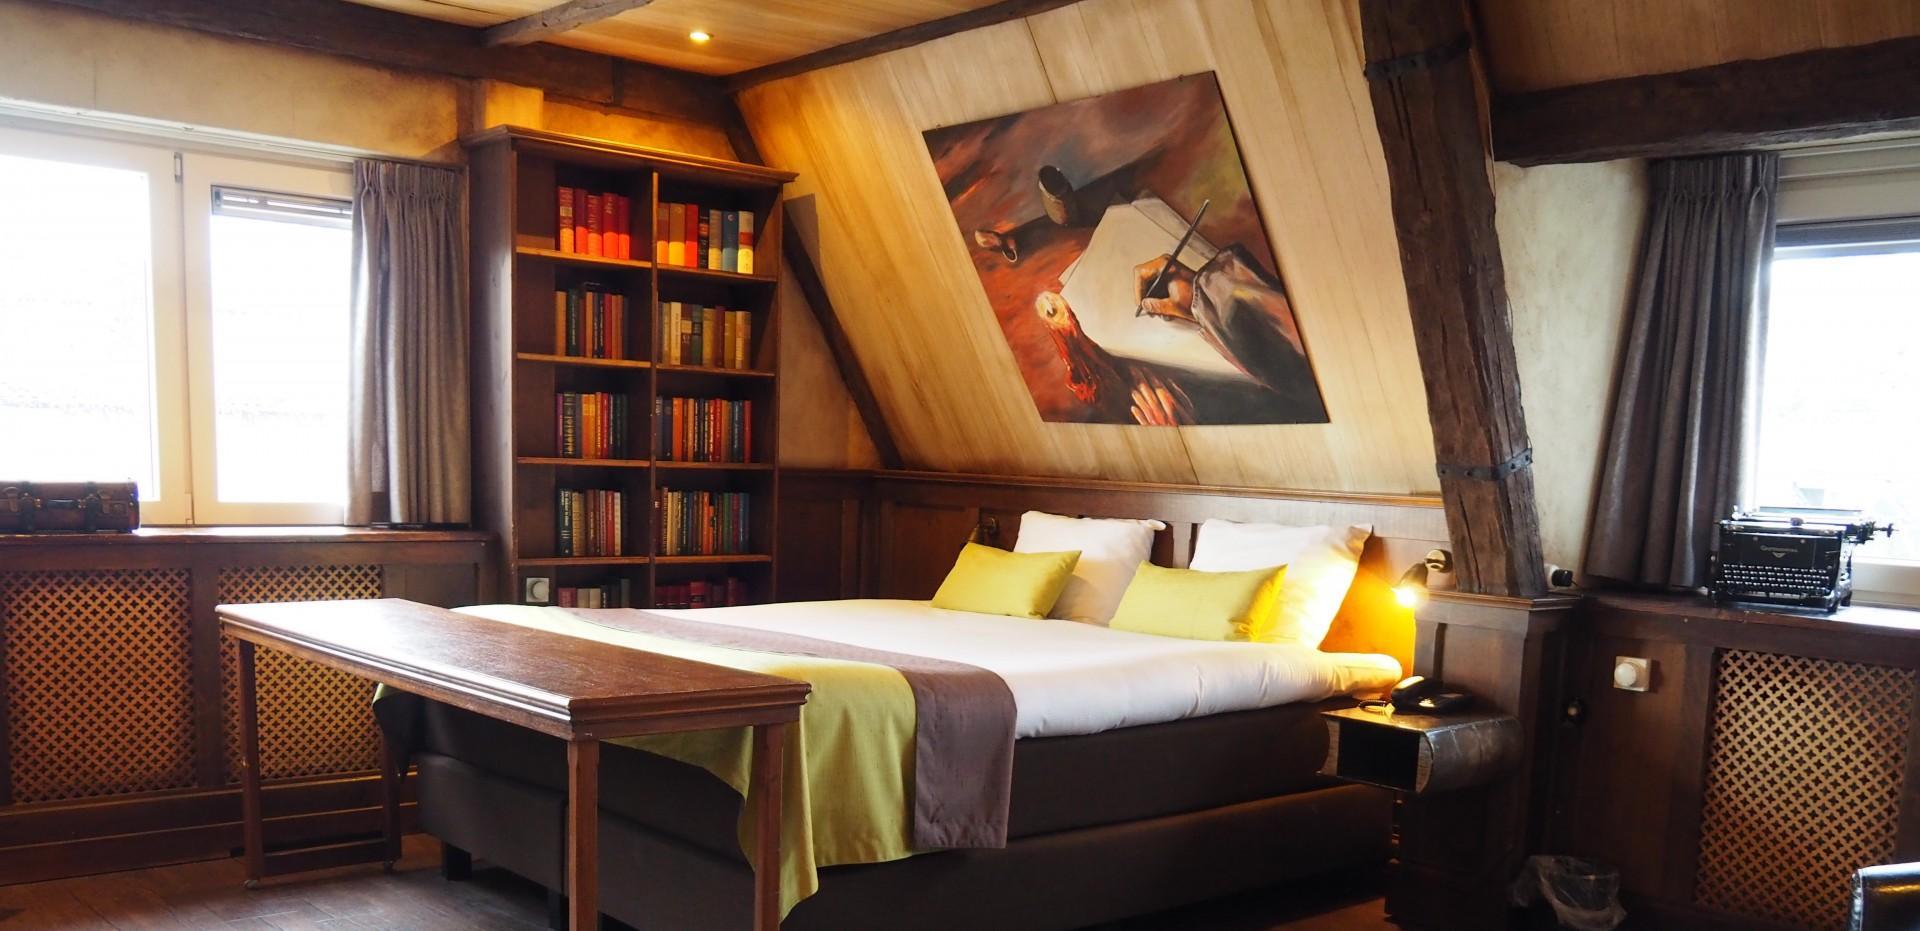 Hotel   Restaurant   Wellness   Lounge   Terras   Vergaderen   Feesten